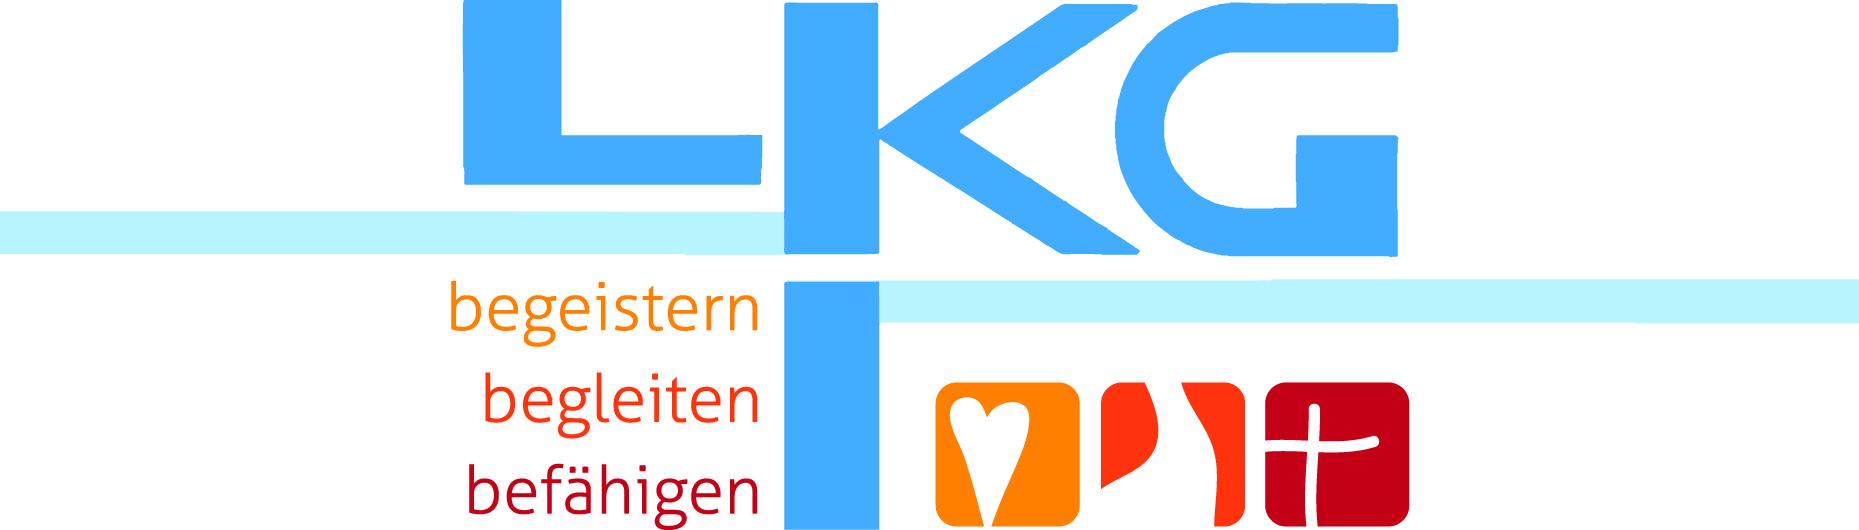 Uffenheim